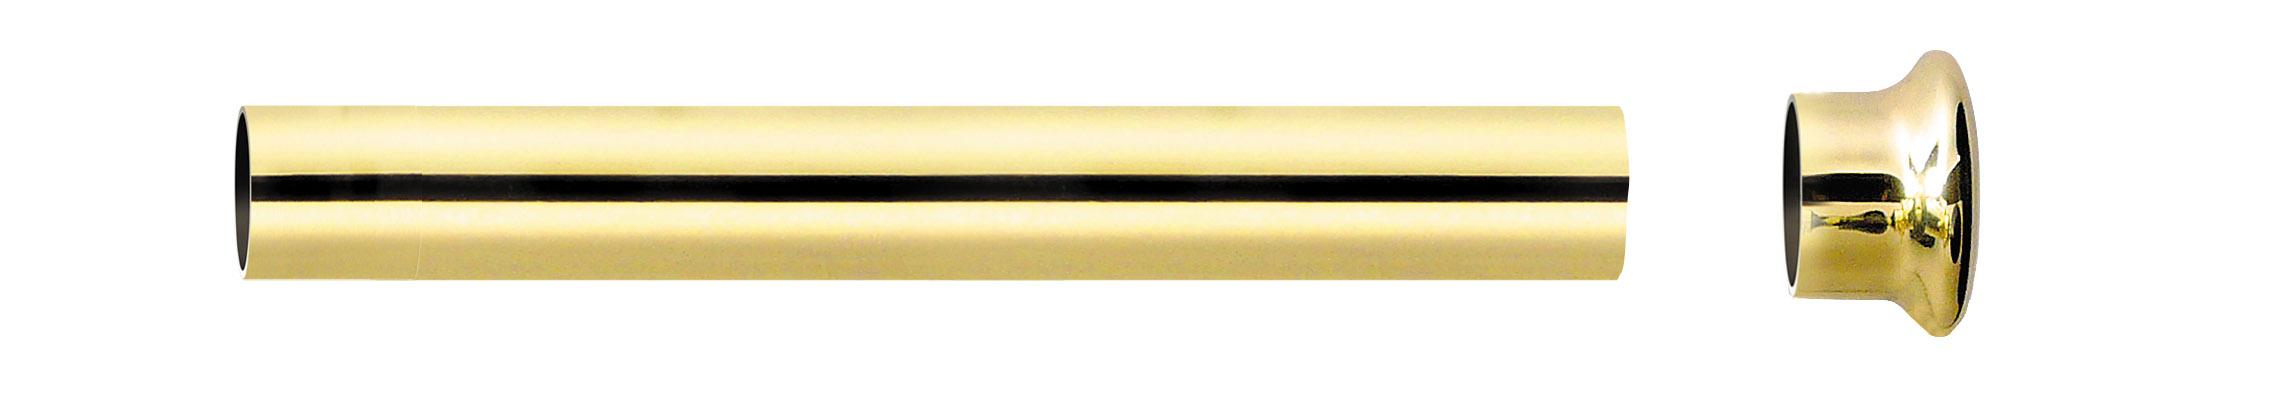 Tube Nu Doré 2 m diam 28mm (Dorée)